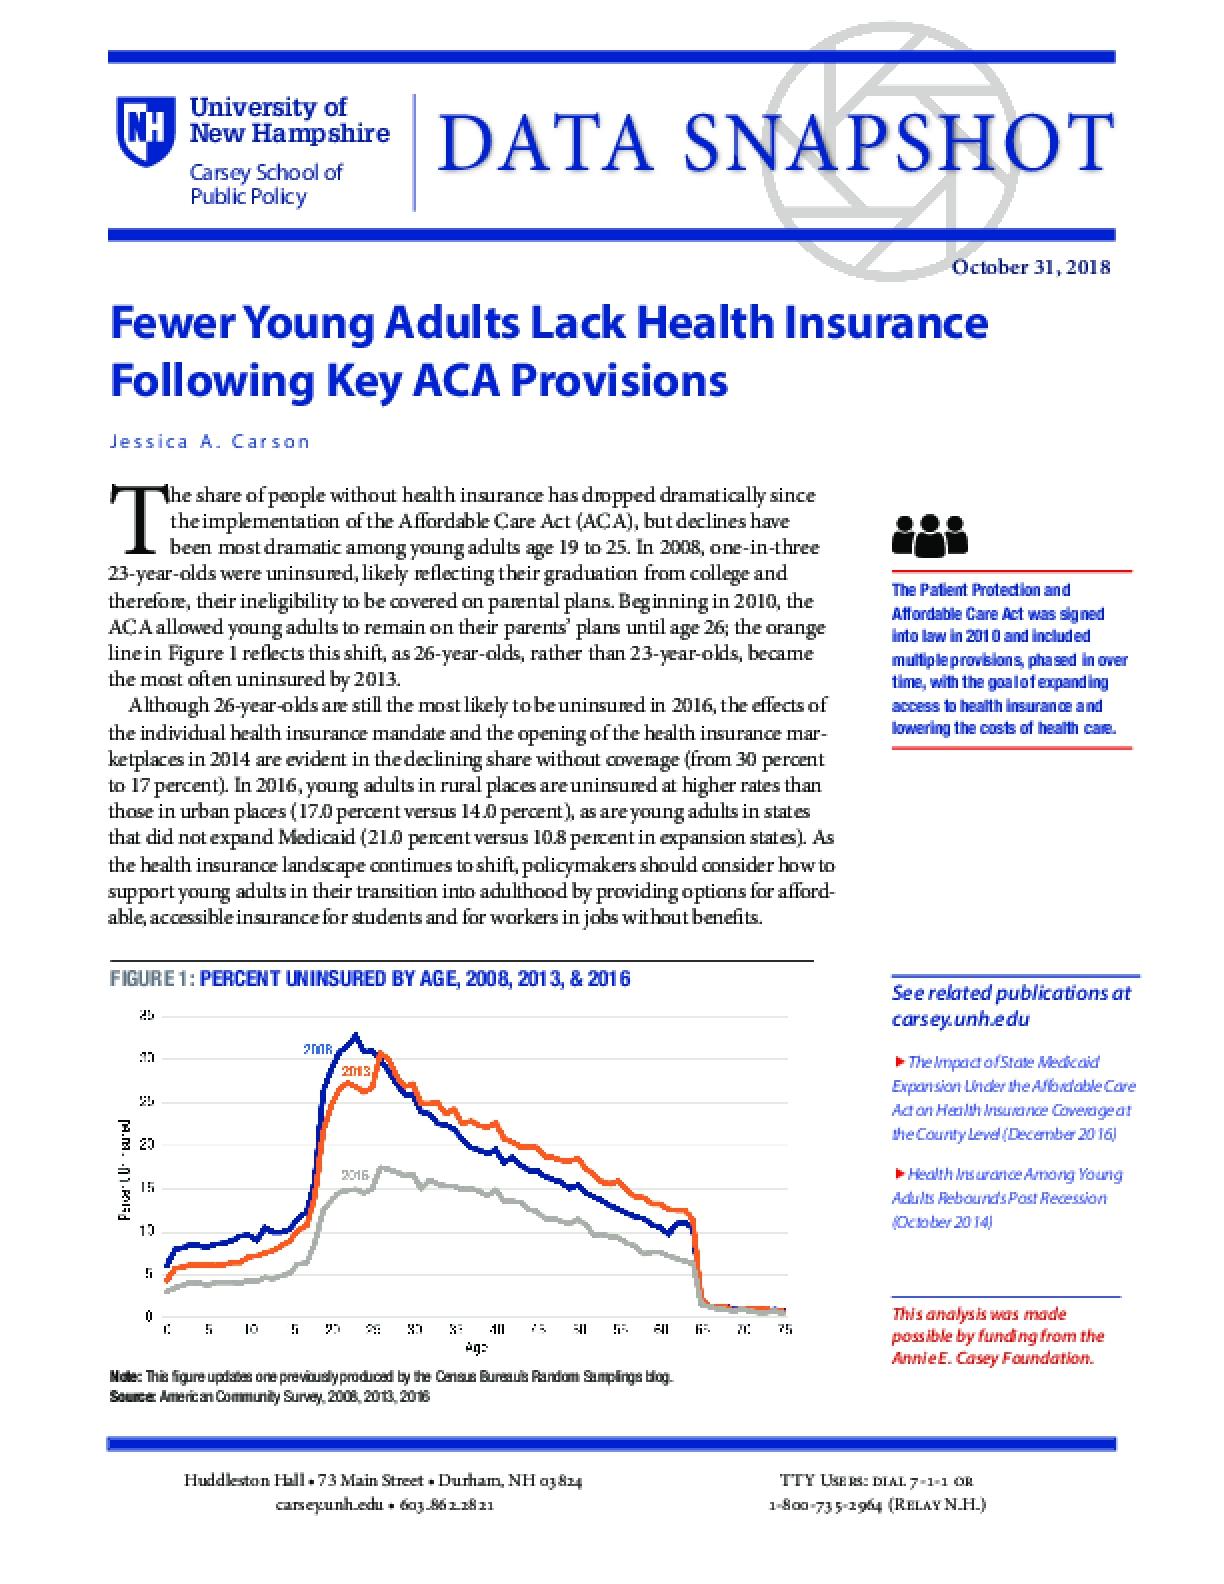 Data Snapshot: Fewer Young Adults Lack Health Insurance Following Key ACA Provisions